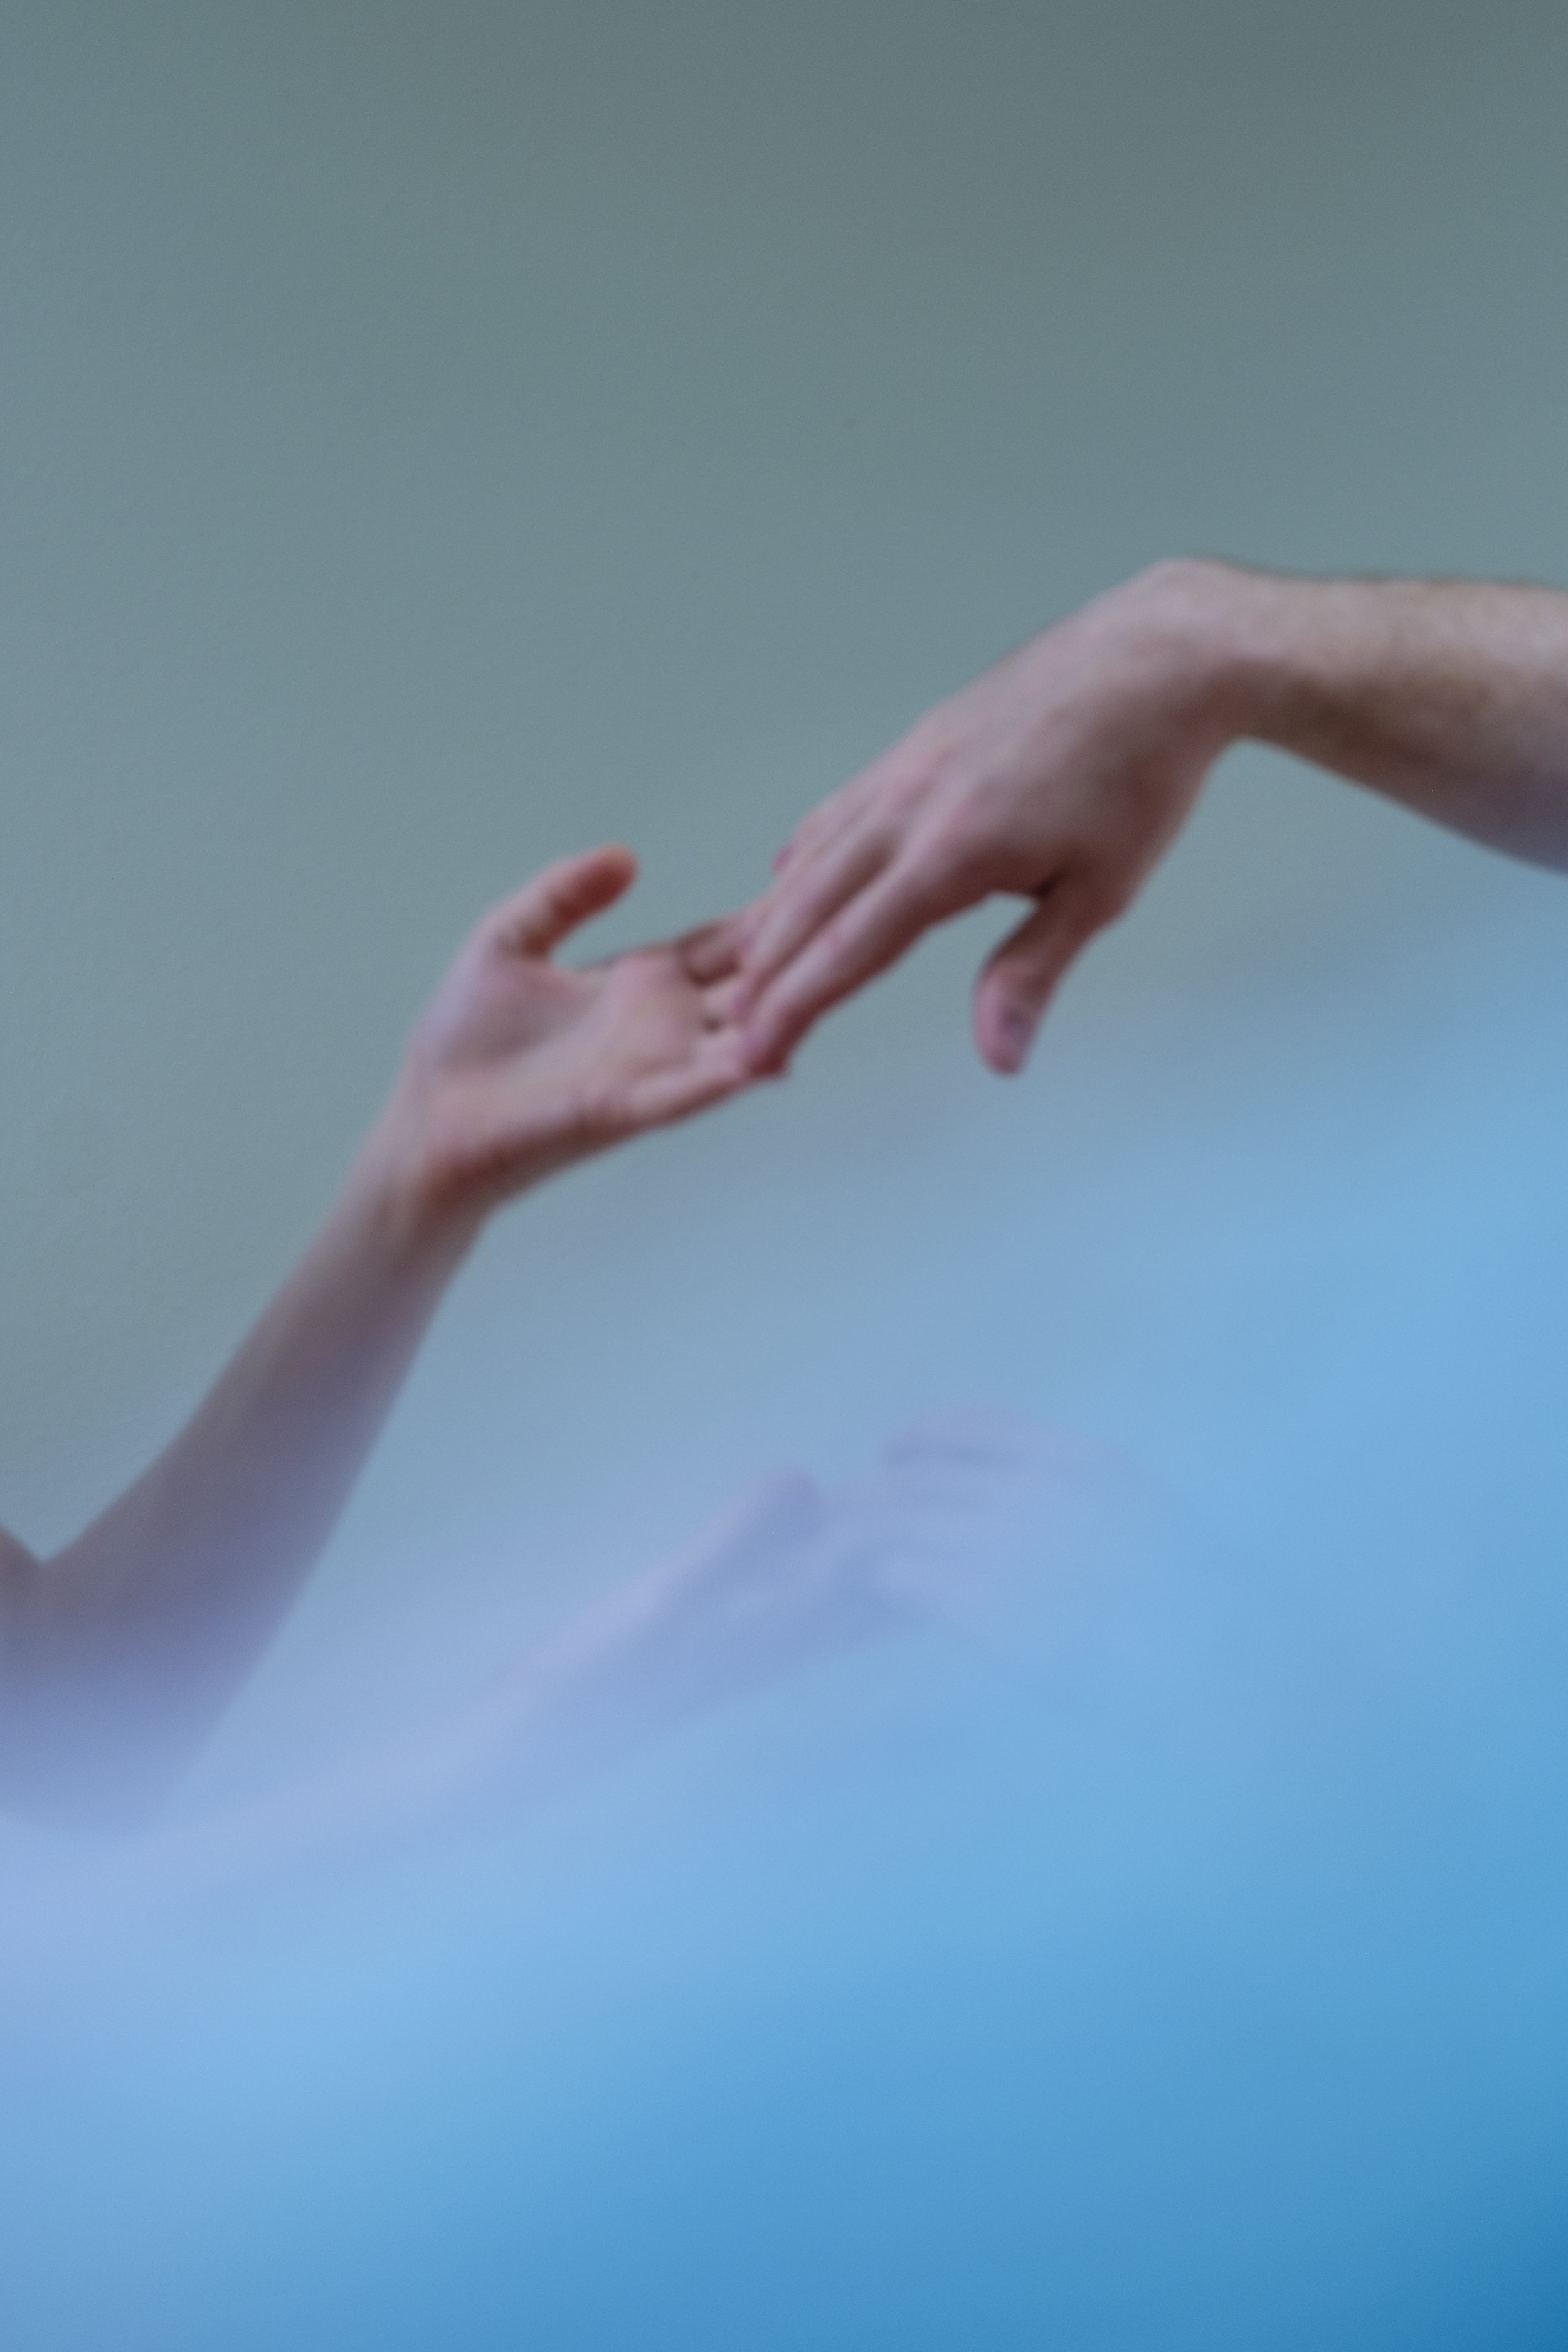 Aura: Where We Meet (intimacy 1) 2017